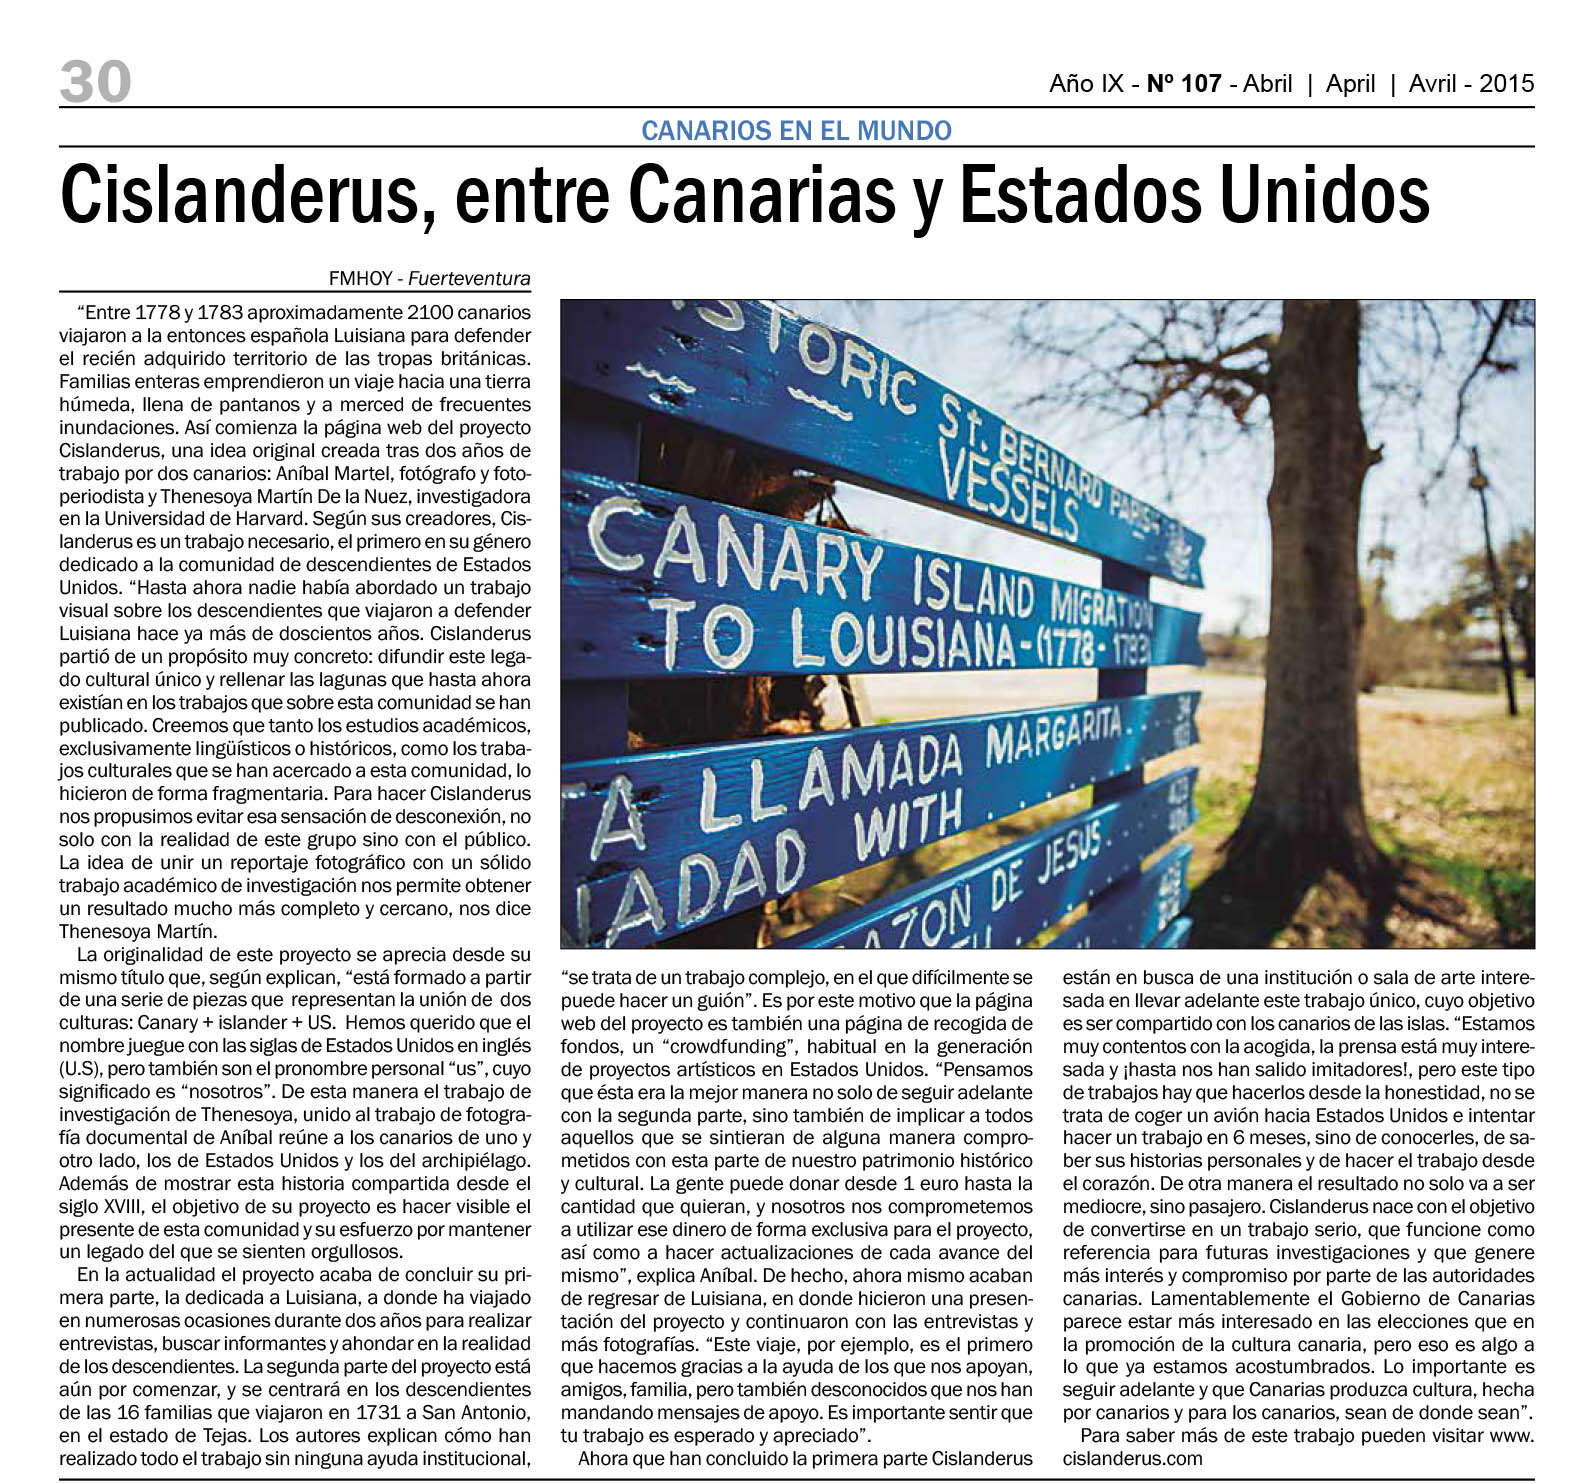 Cislanderus_FMHOY_042015-1.jpg